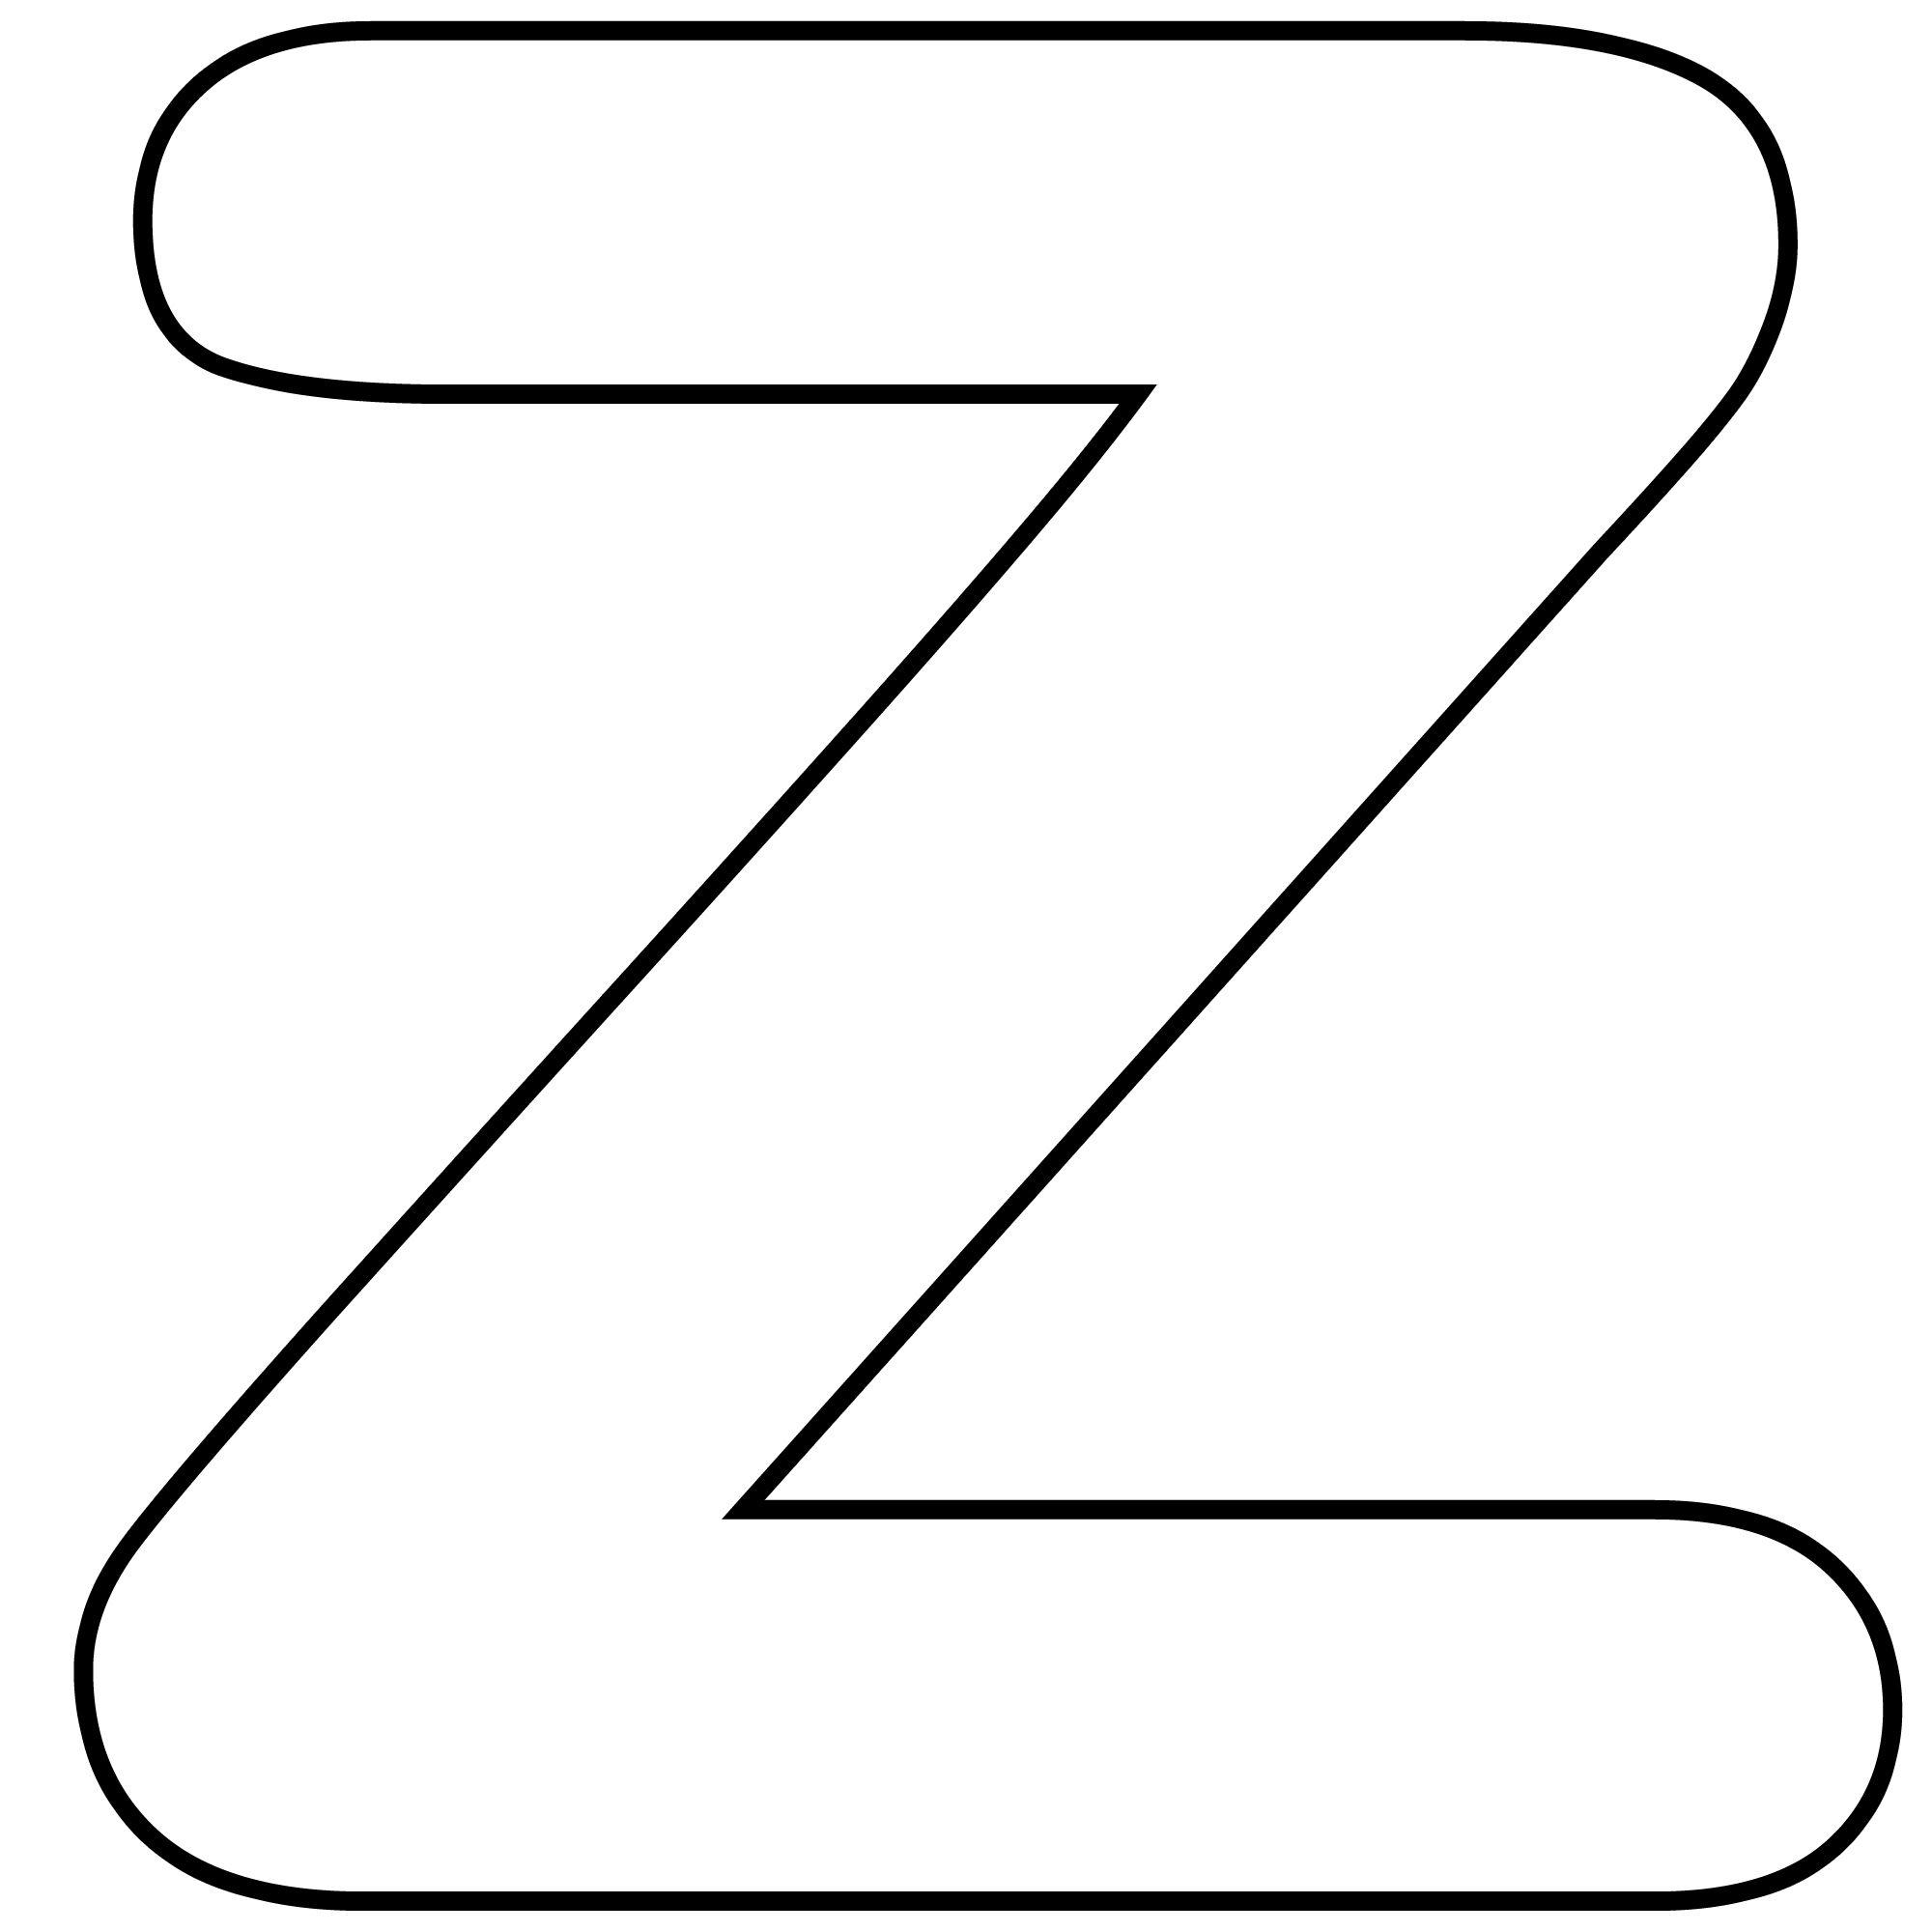 Printable Lower Case Alphabet Letter z Template for Kids